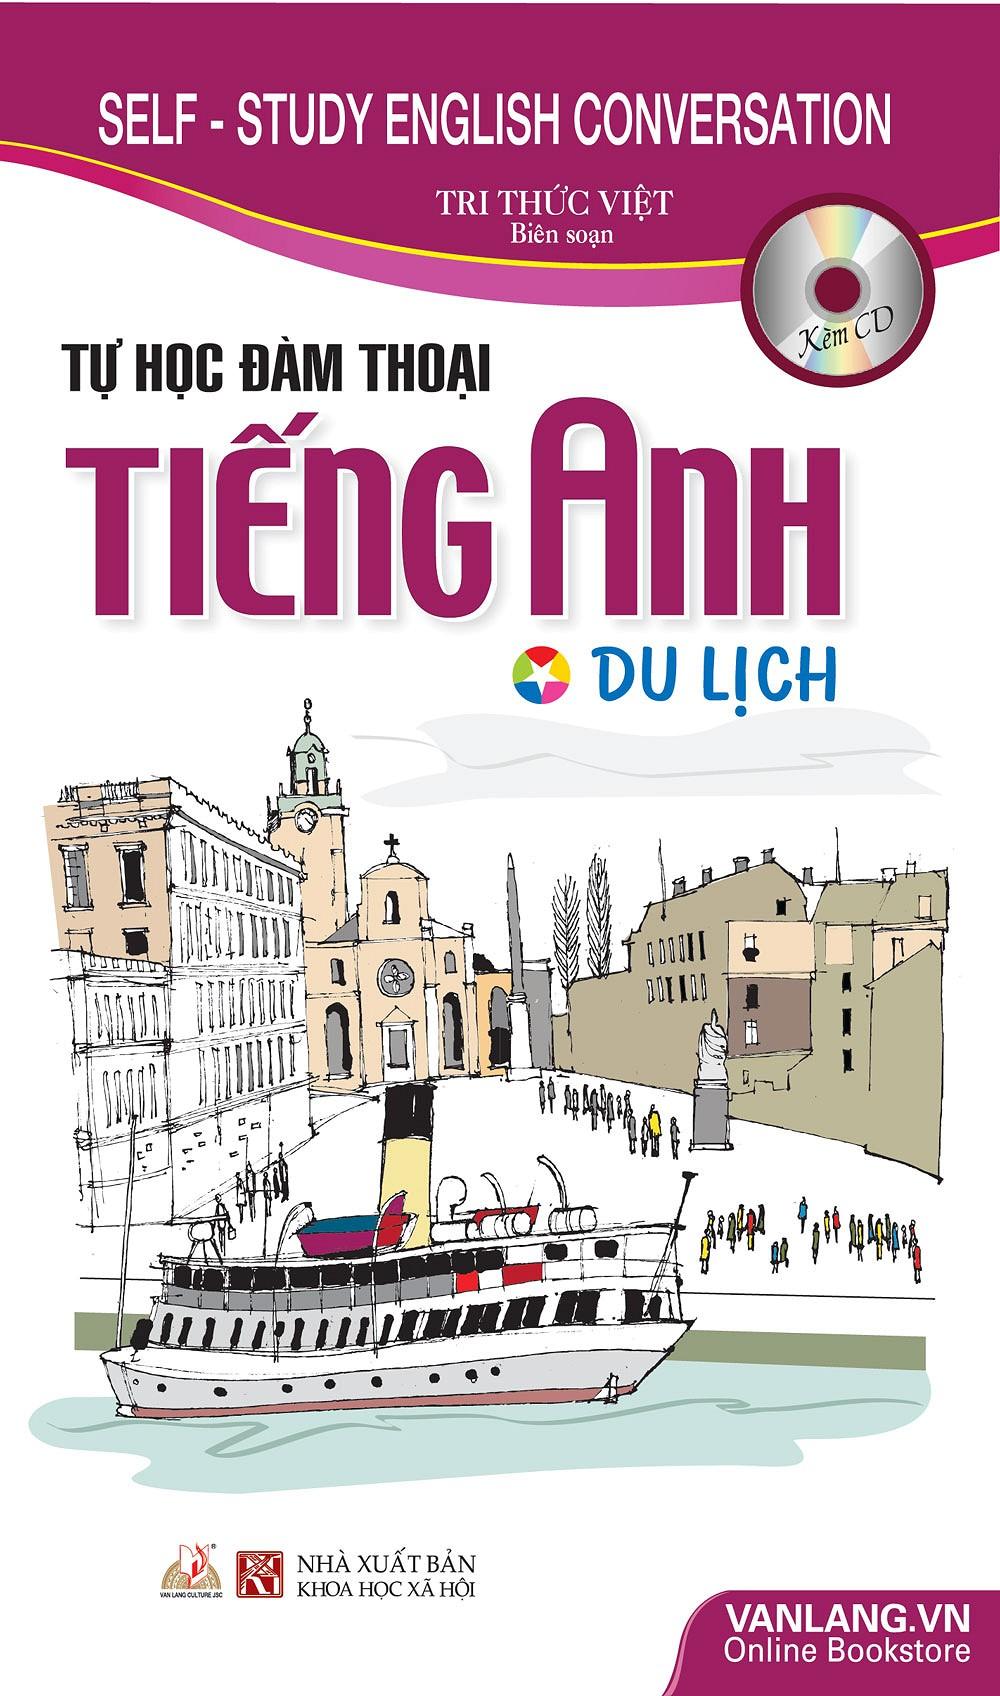 tu-hoc-dam-thoai-tieng-anh-du-lich-01.u547.d20160614.t155935.jpg